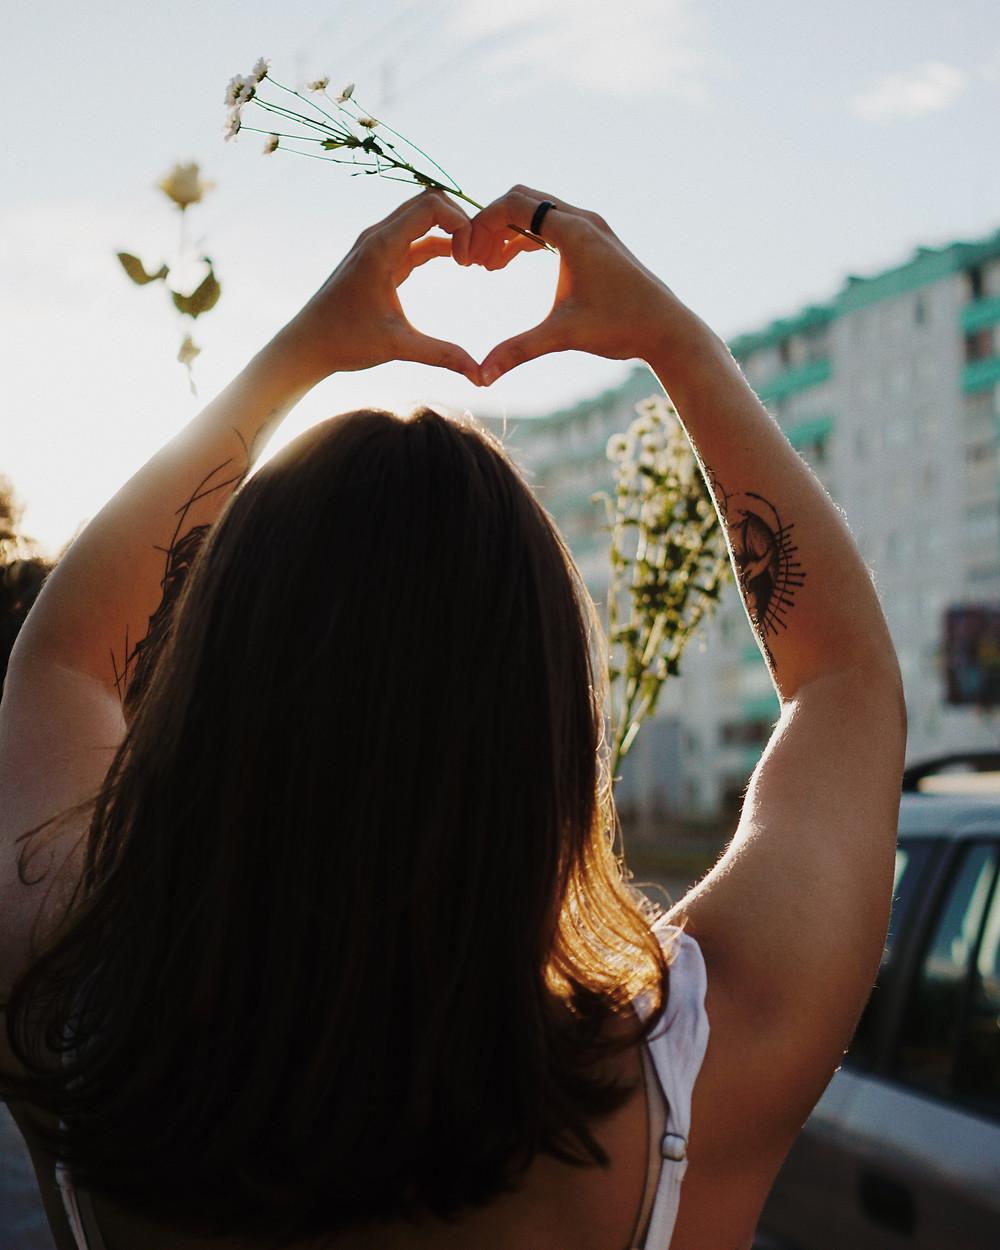 Loving nature, organic, plants, woman, love heart